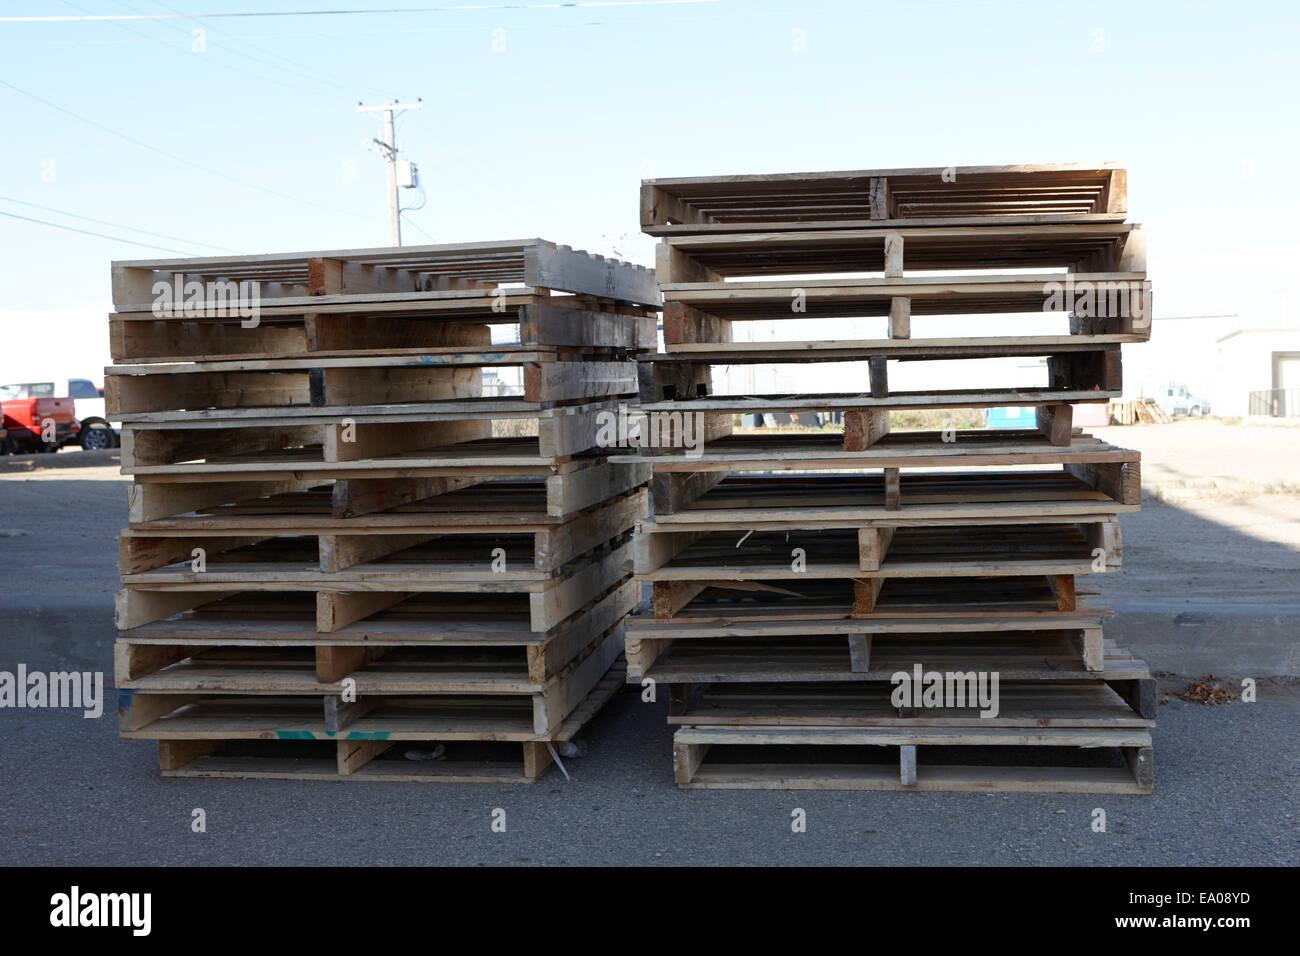 pile of wooden pallet waste Saskatchewan Canada - Stock Image